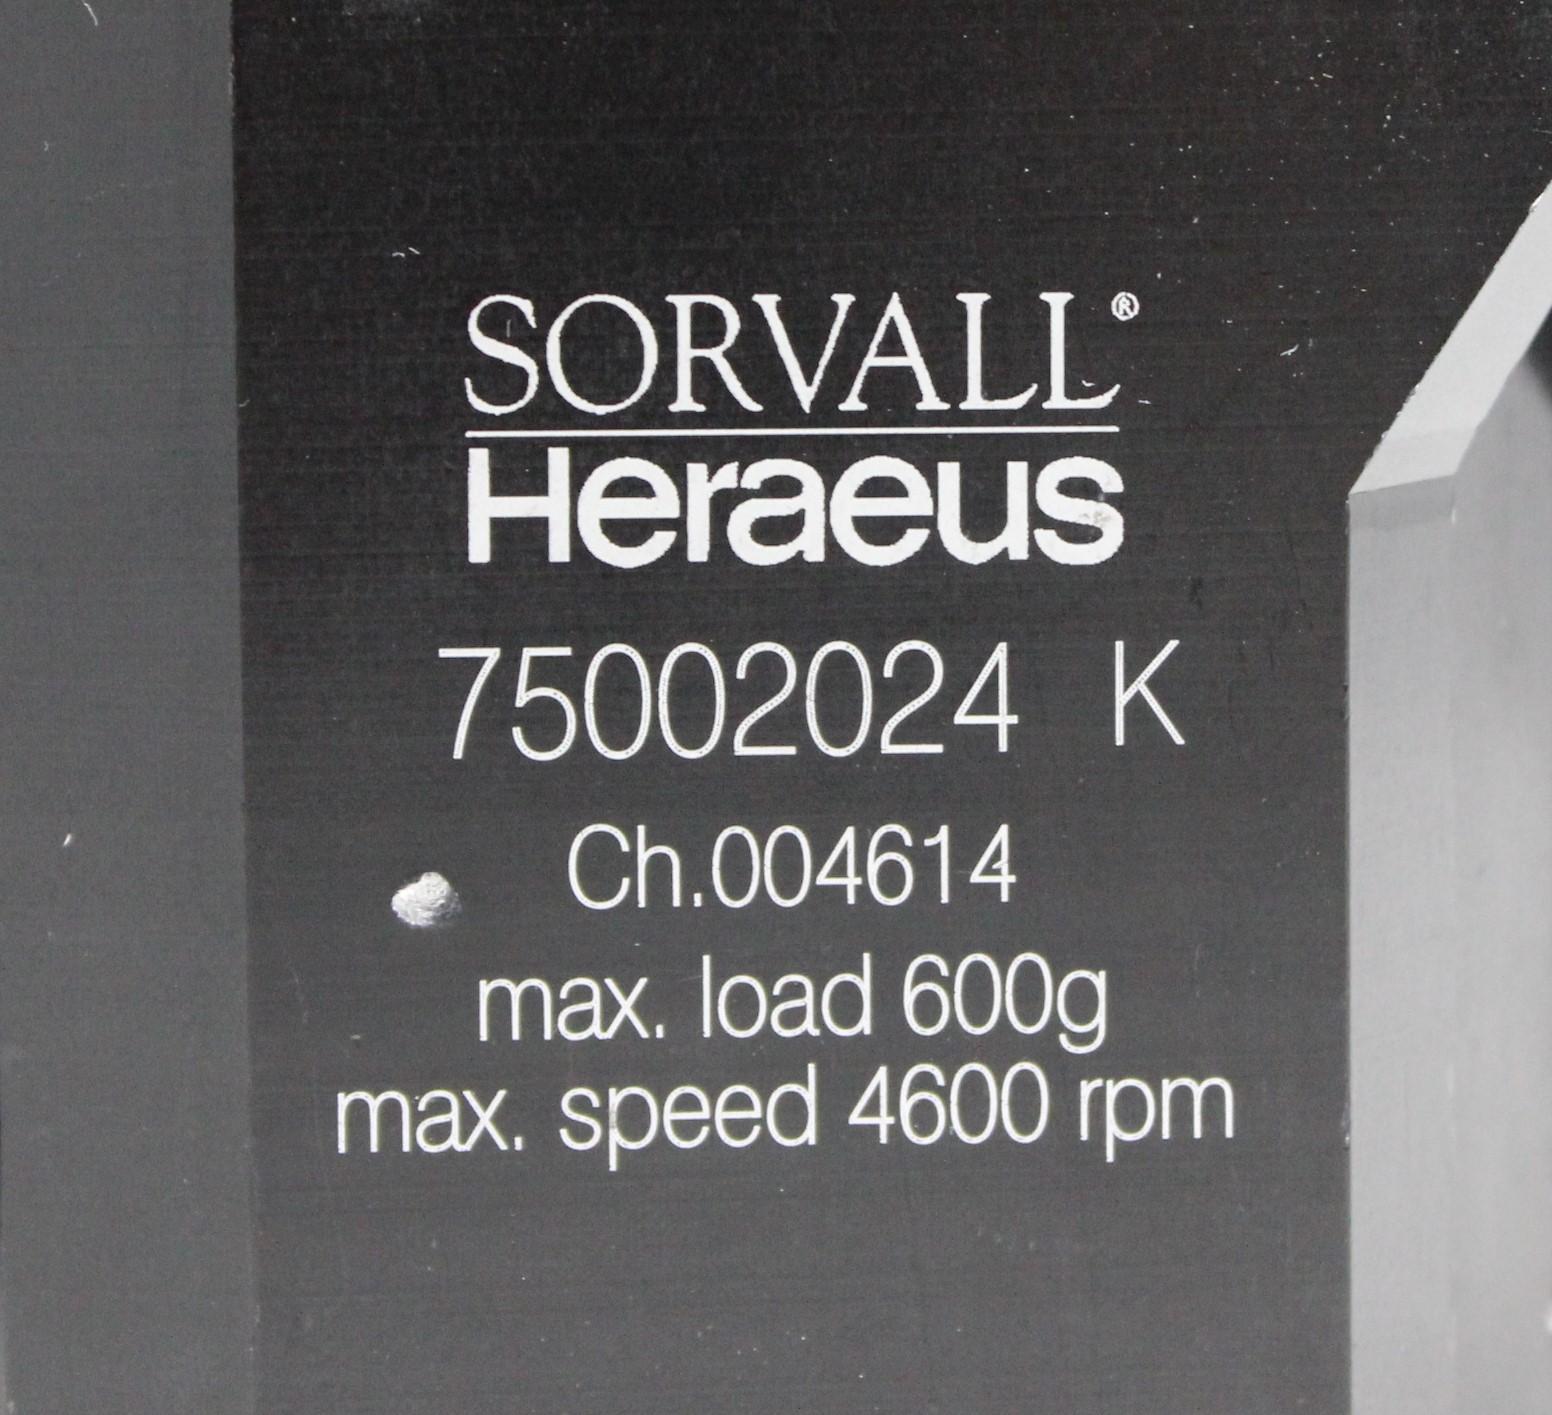 Image SORVALL HERAEUS 75002024 K Centrifuge Buckets - 7-Place, 600g, 4600rpm 1587206